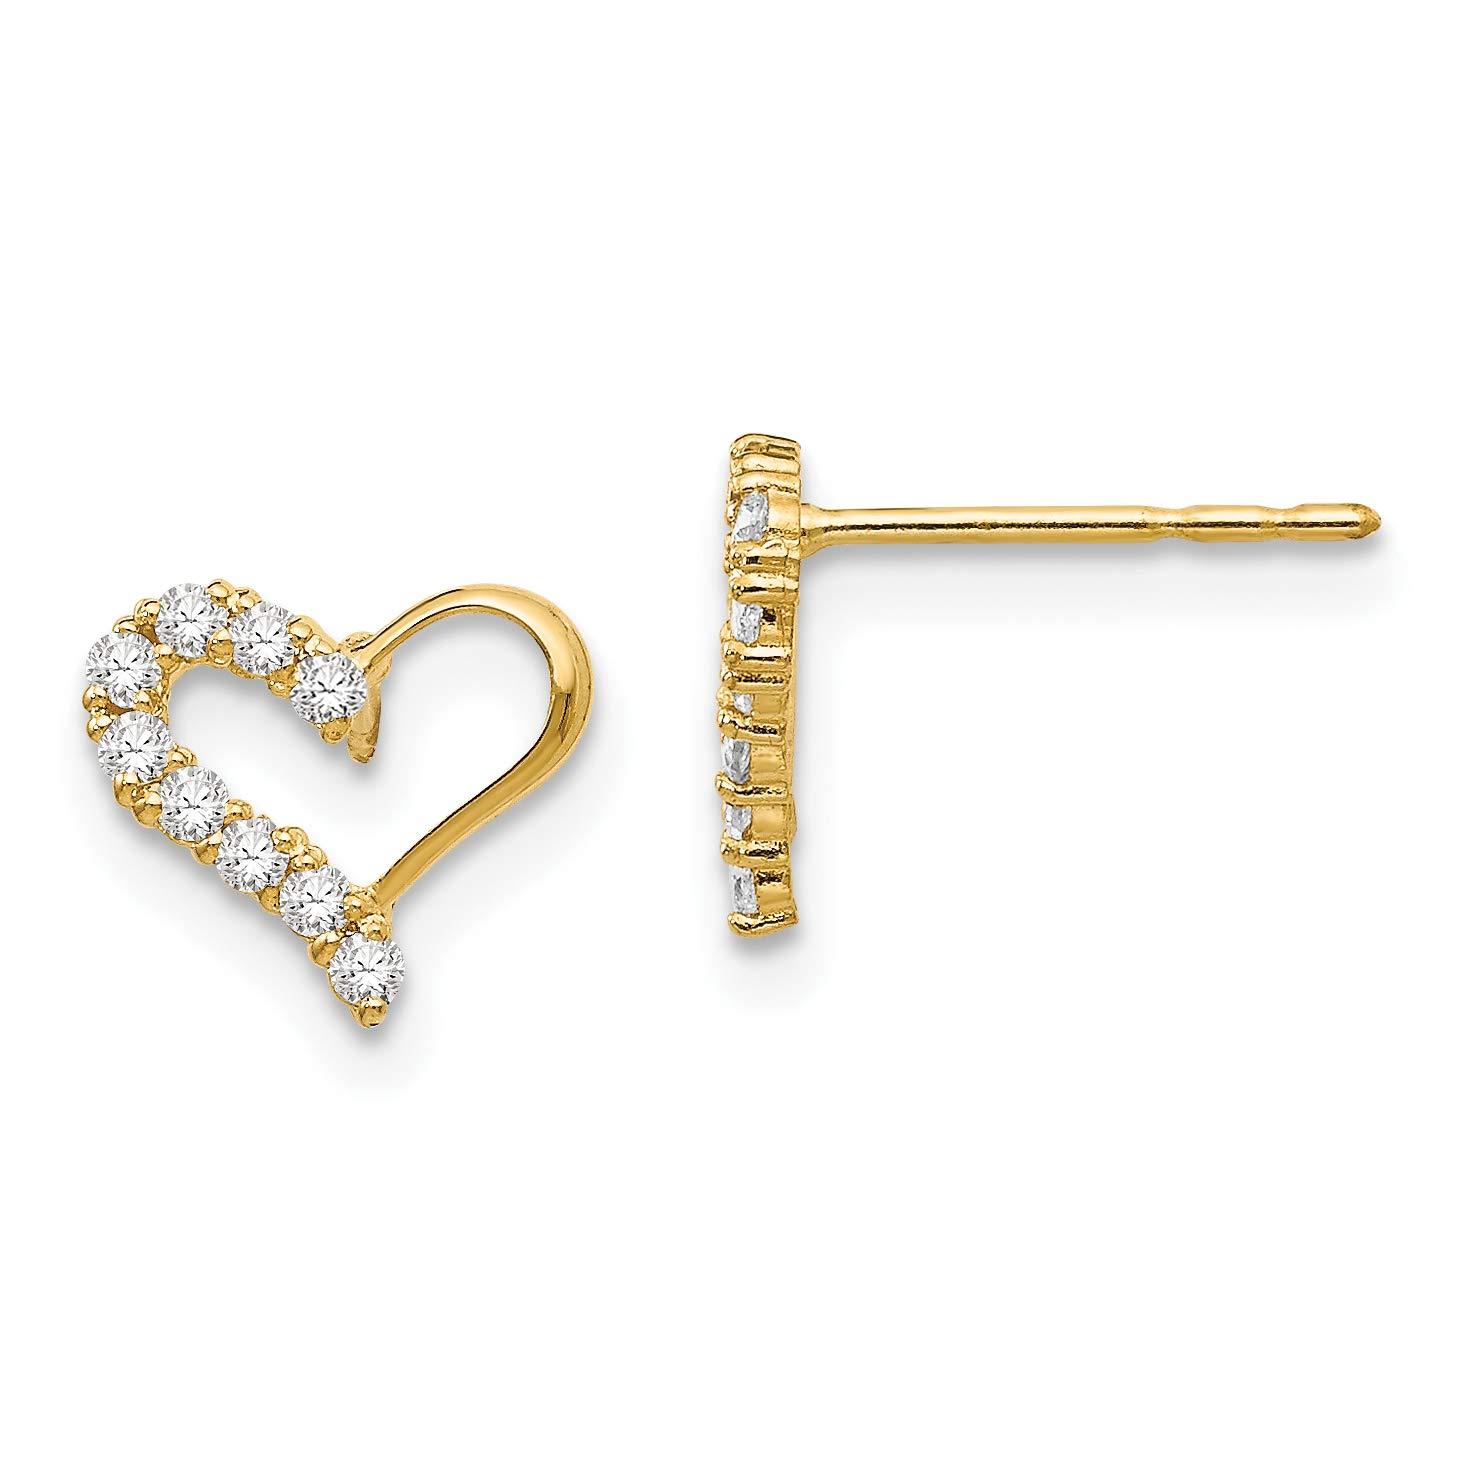 14K Yellow Gold Madi K Childrens 8 MM CZ Heart Post Stud Earrings